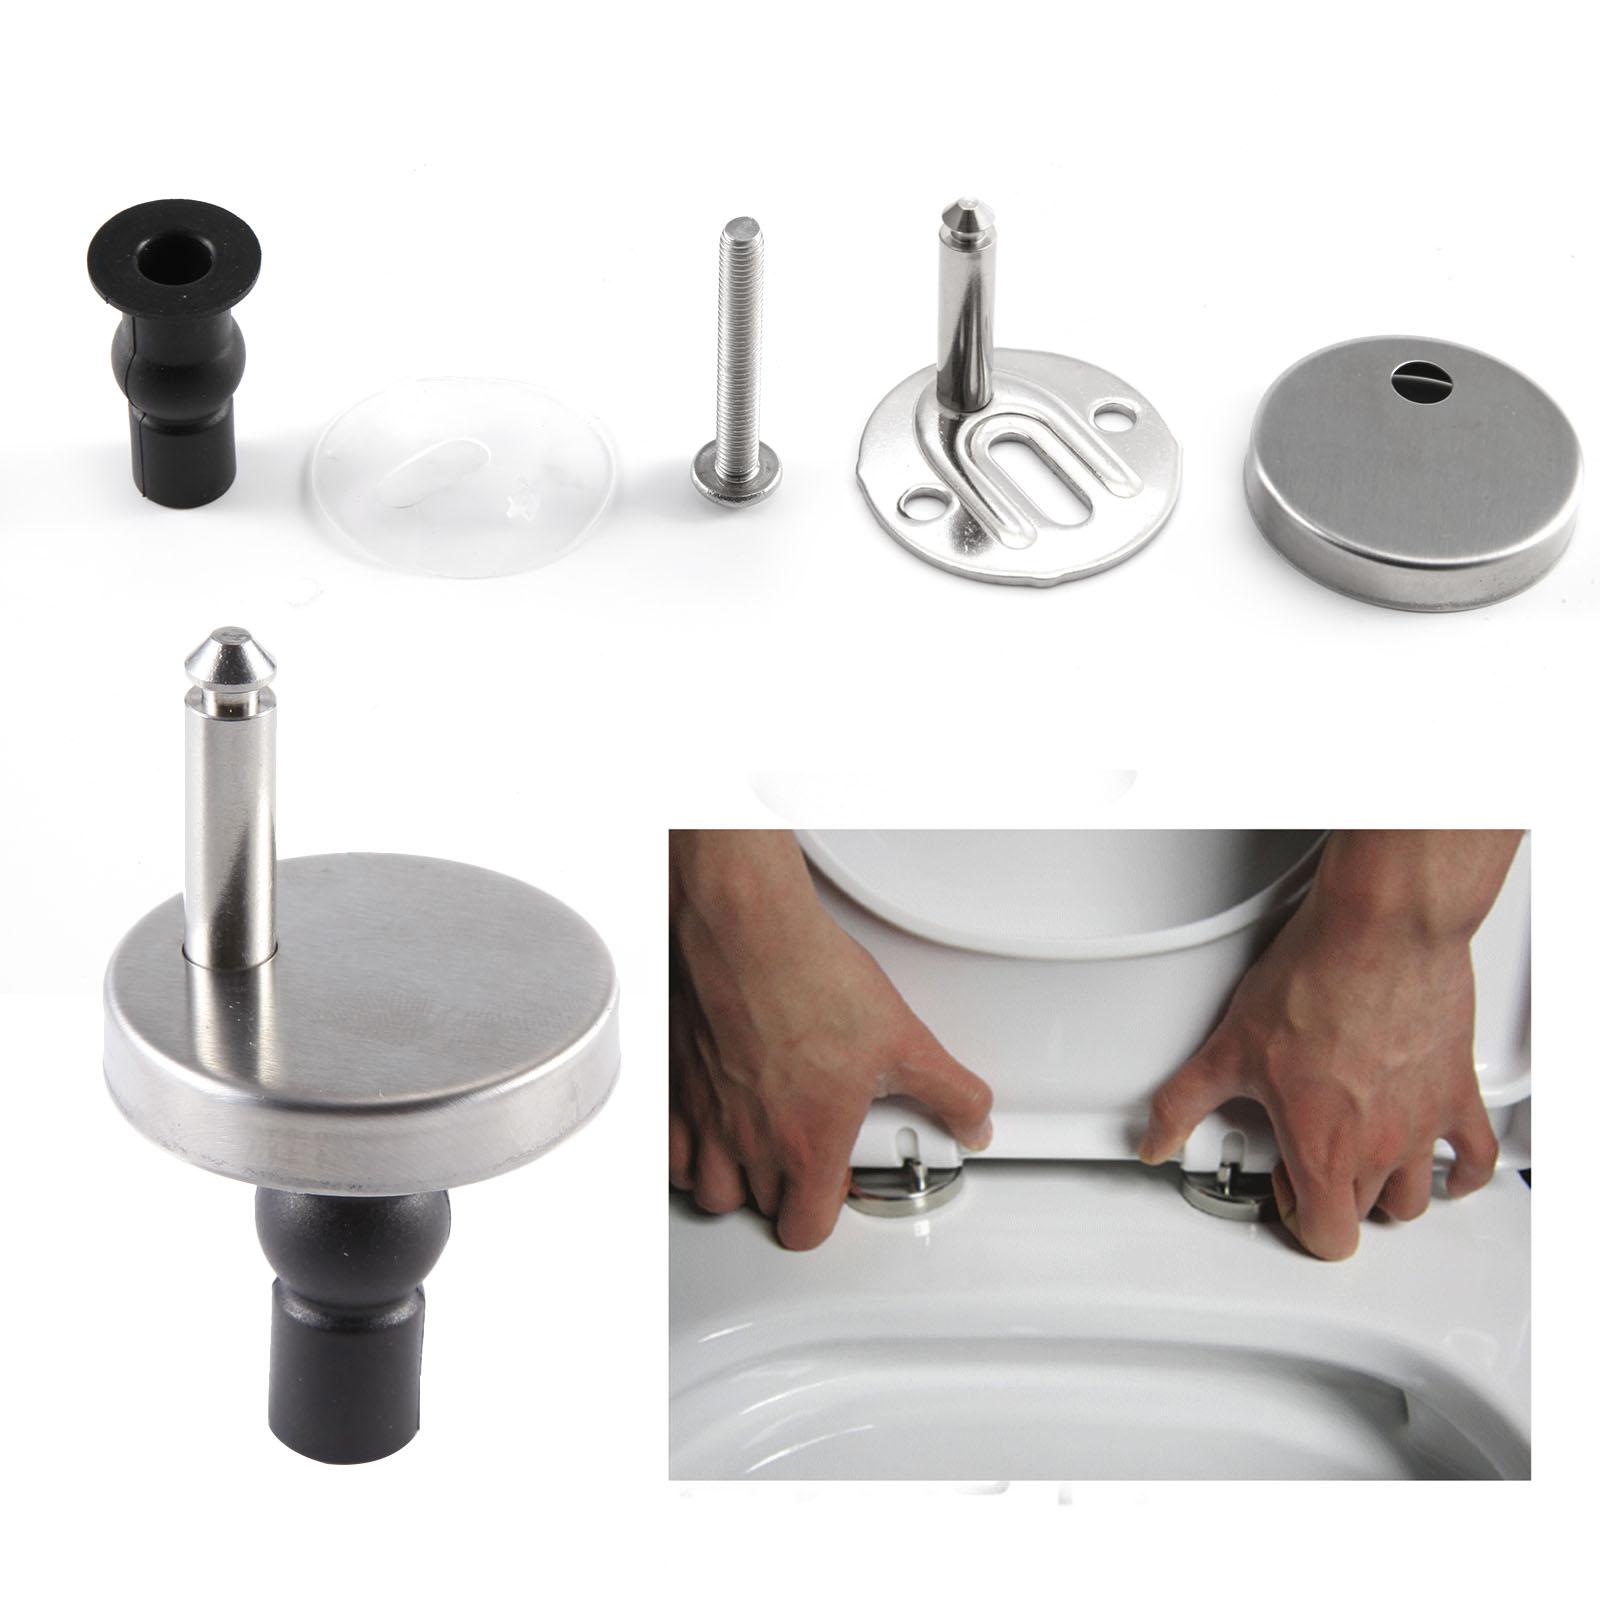 laufen toilet seat fixing instructions